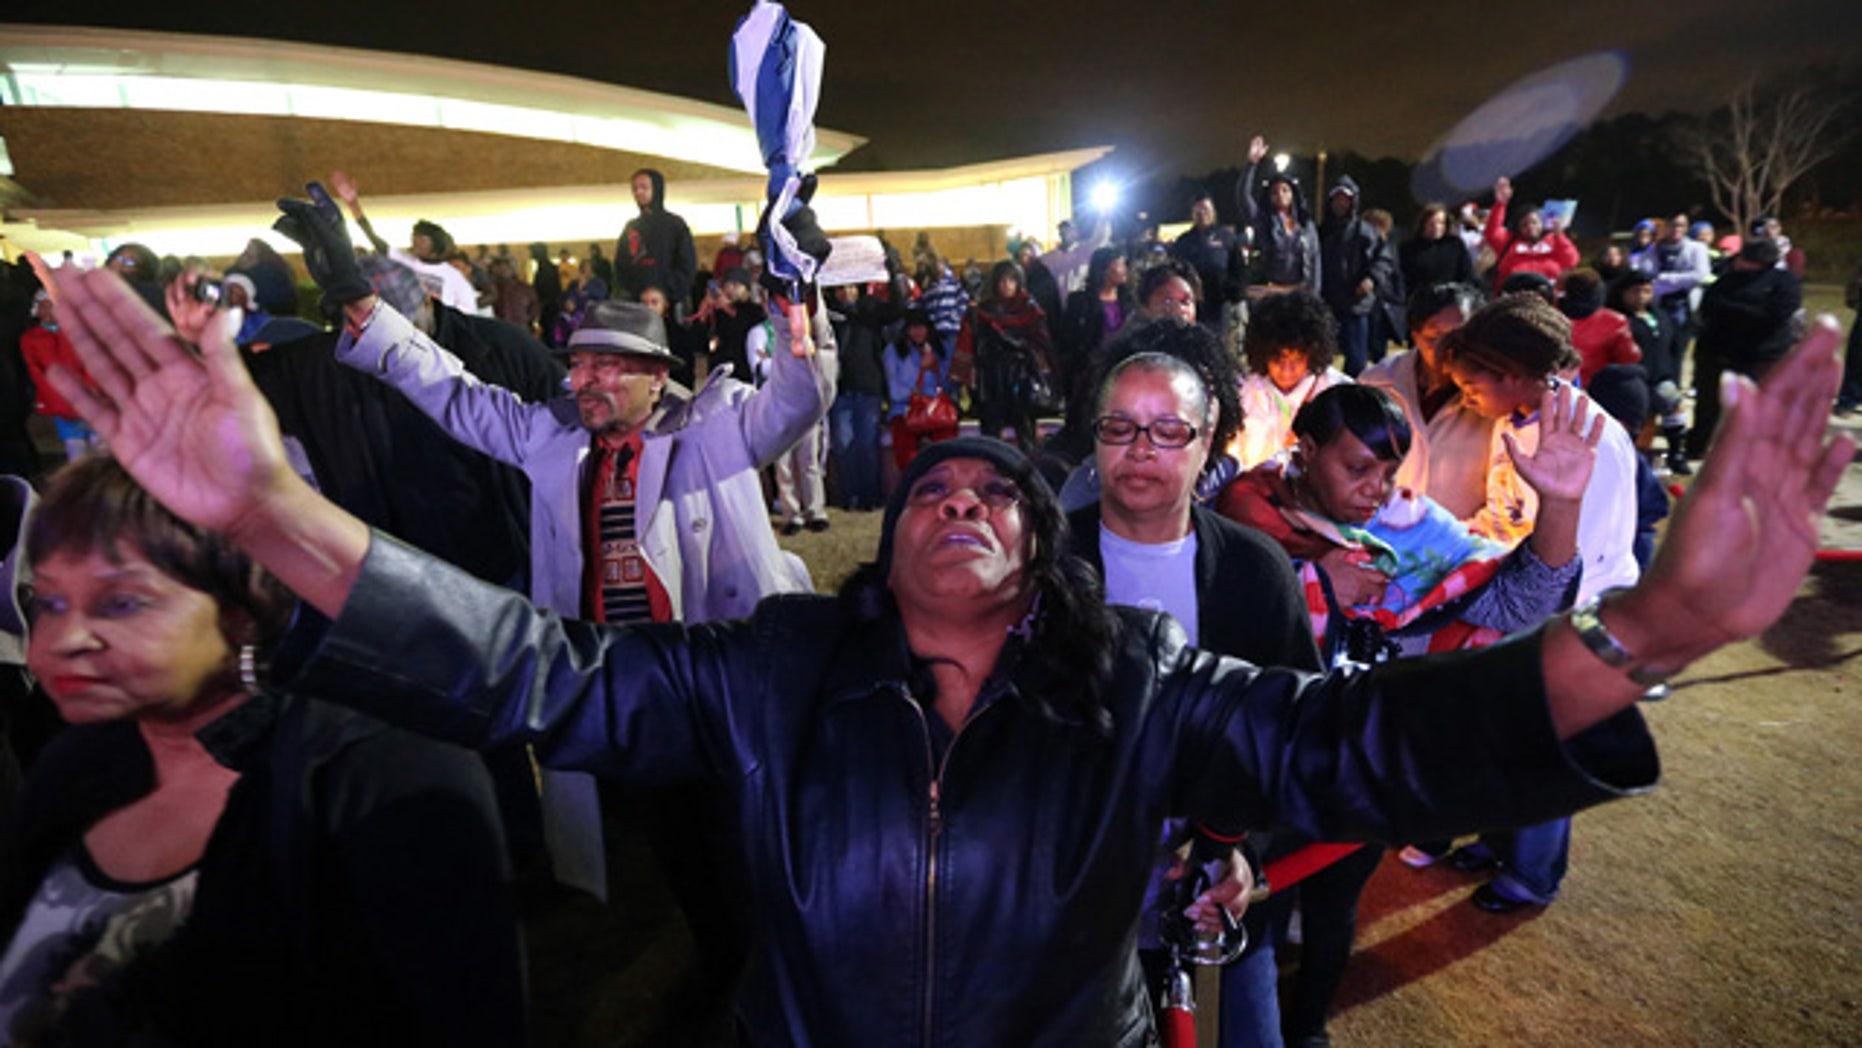 Feb. 9, 2015: Denice Matthews of Riverdale, Ga., joins several hundred people at the Riverdale amphitheater for a prayer vigil for Bobbi Kristina Brown. (AP Photo/Atlanta Journal-Constitution, Ben Gray)